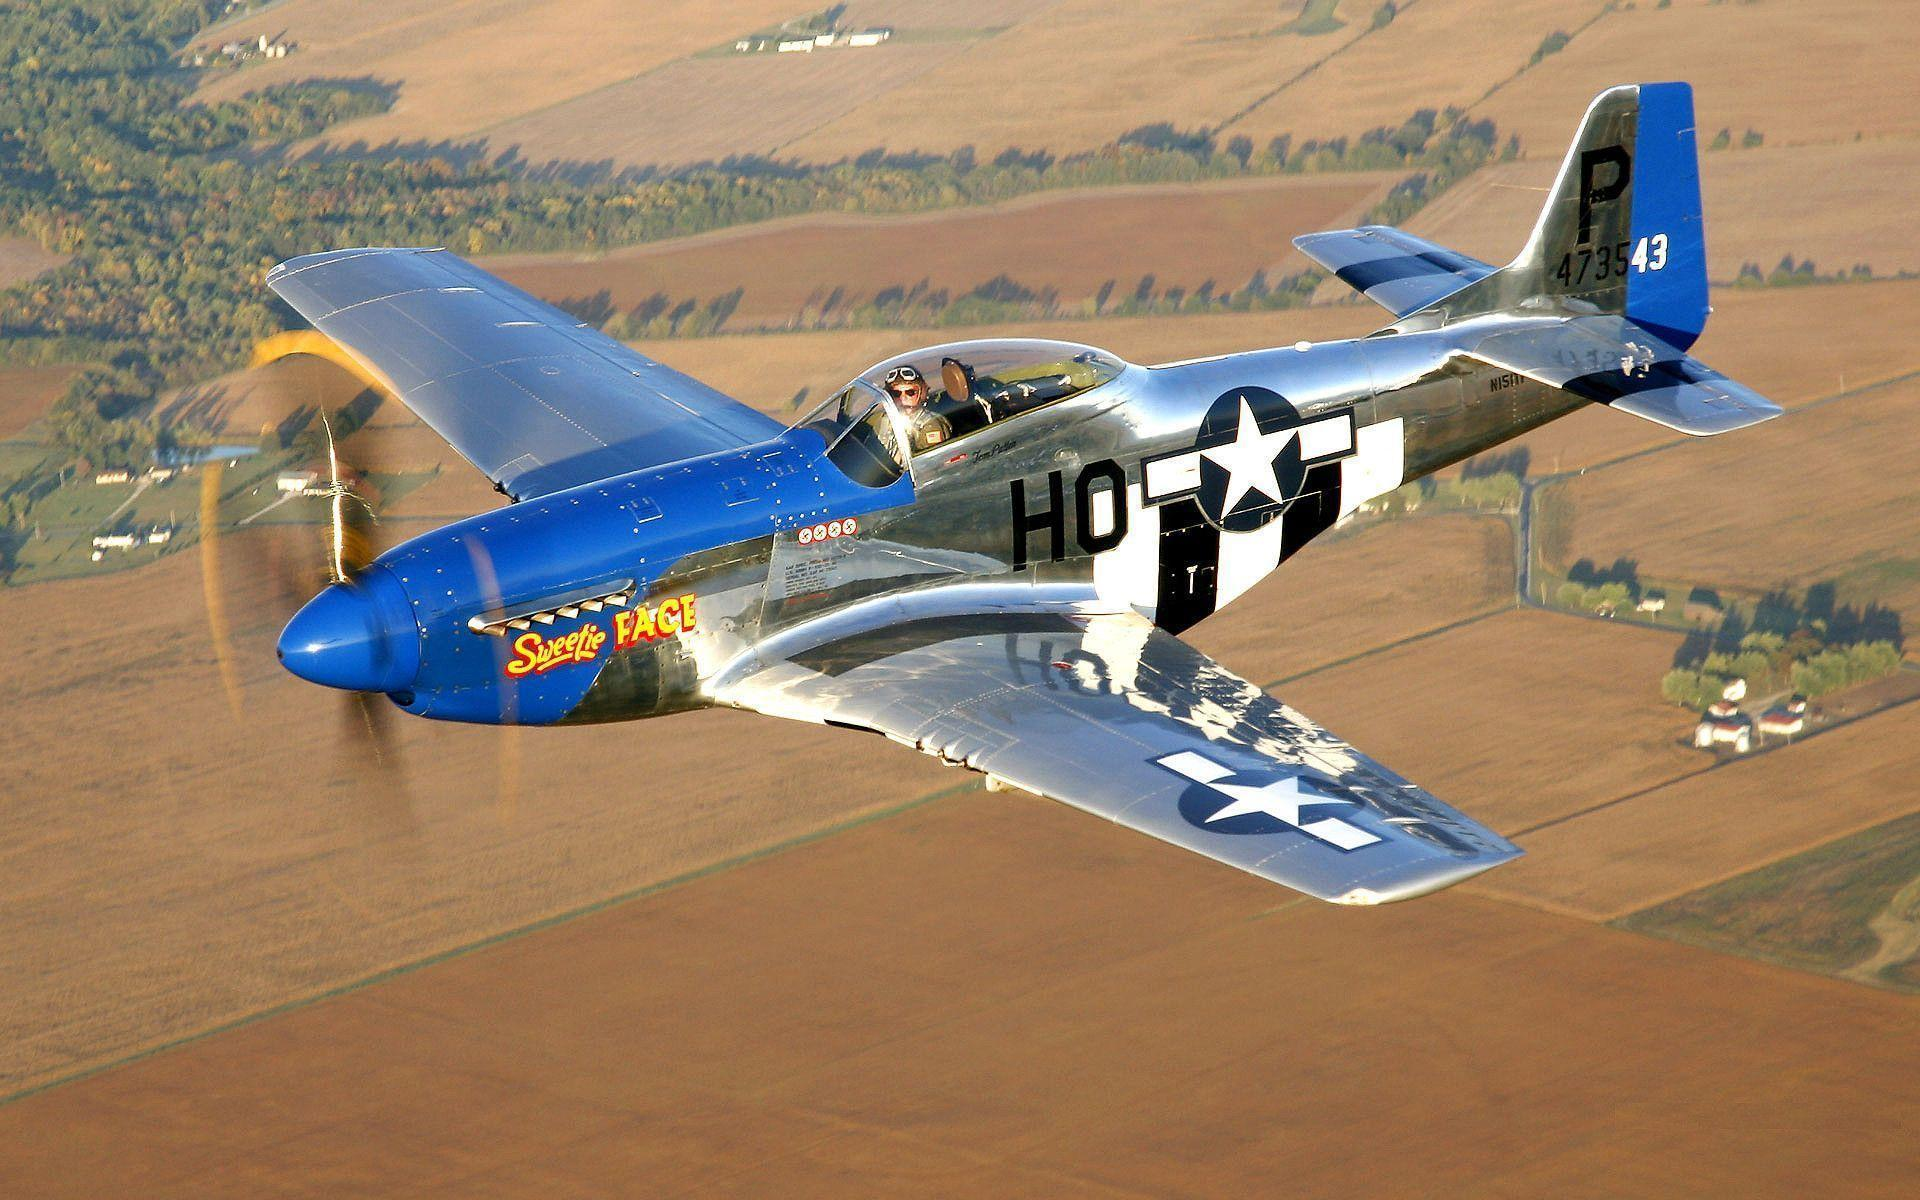 vintage Aircraft illustration WWII vintage airplane aviation |Vintage Jet Planes